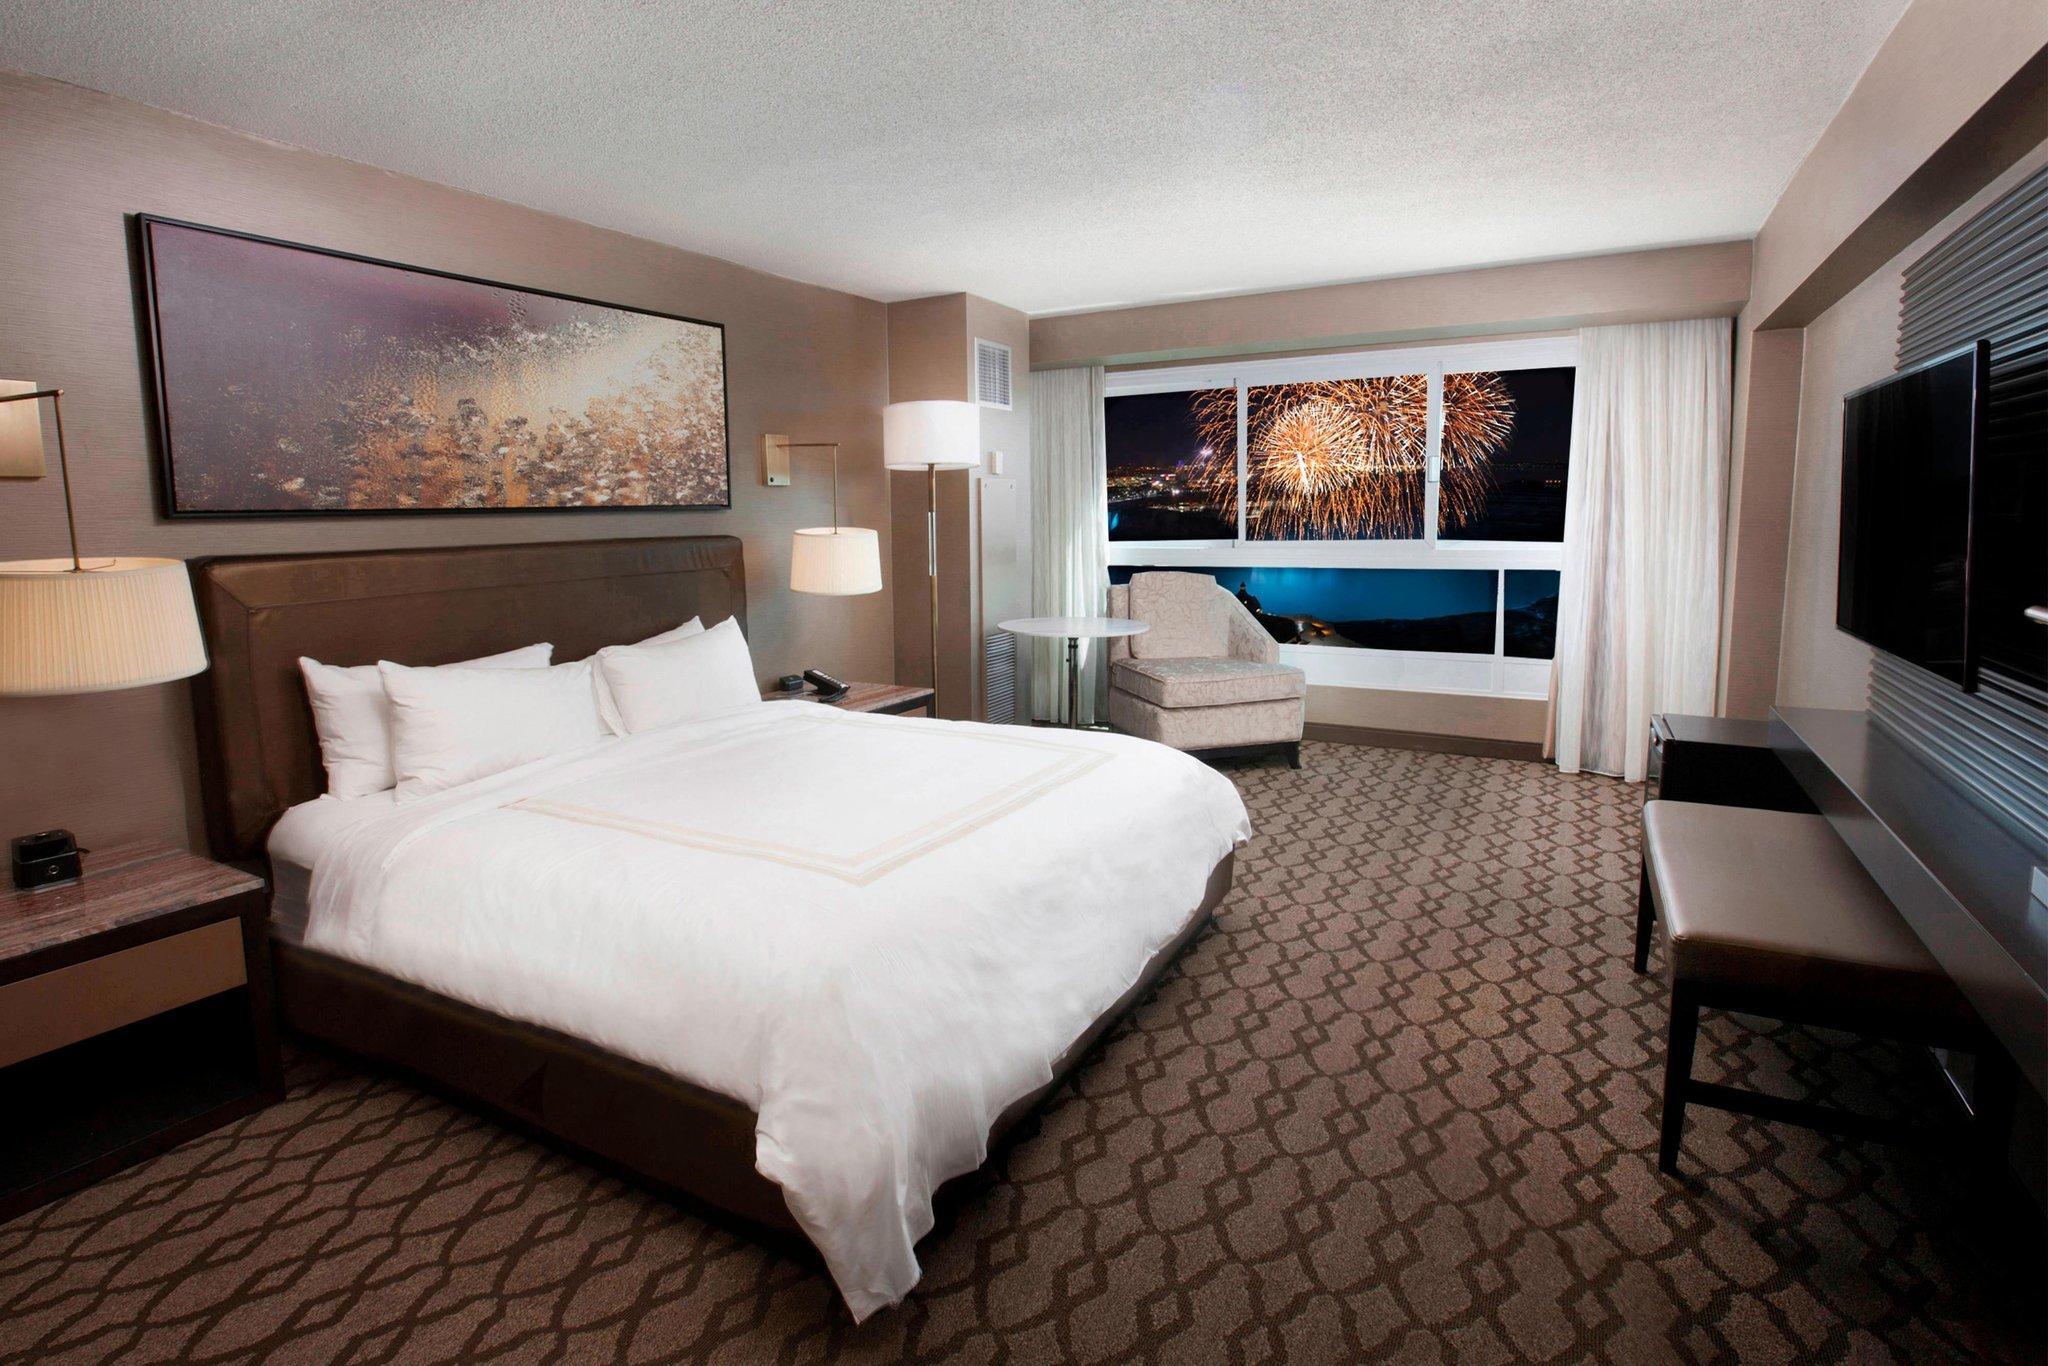 Full Size of Kingsize Bett Niagara Falls Marriott Fallsview Hotel Spa Poco Gebrauchte Betten Innocent Günstige 140x200 Massivholz Trends Bei Ikea Jabo Teenager Günstig Bett Poco Betten